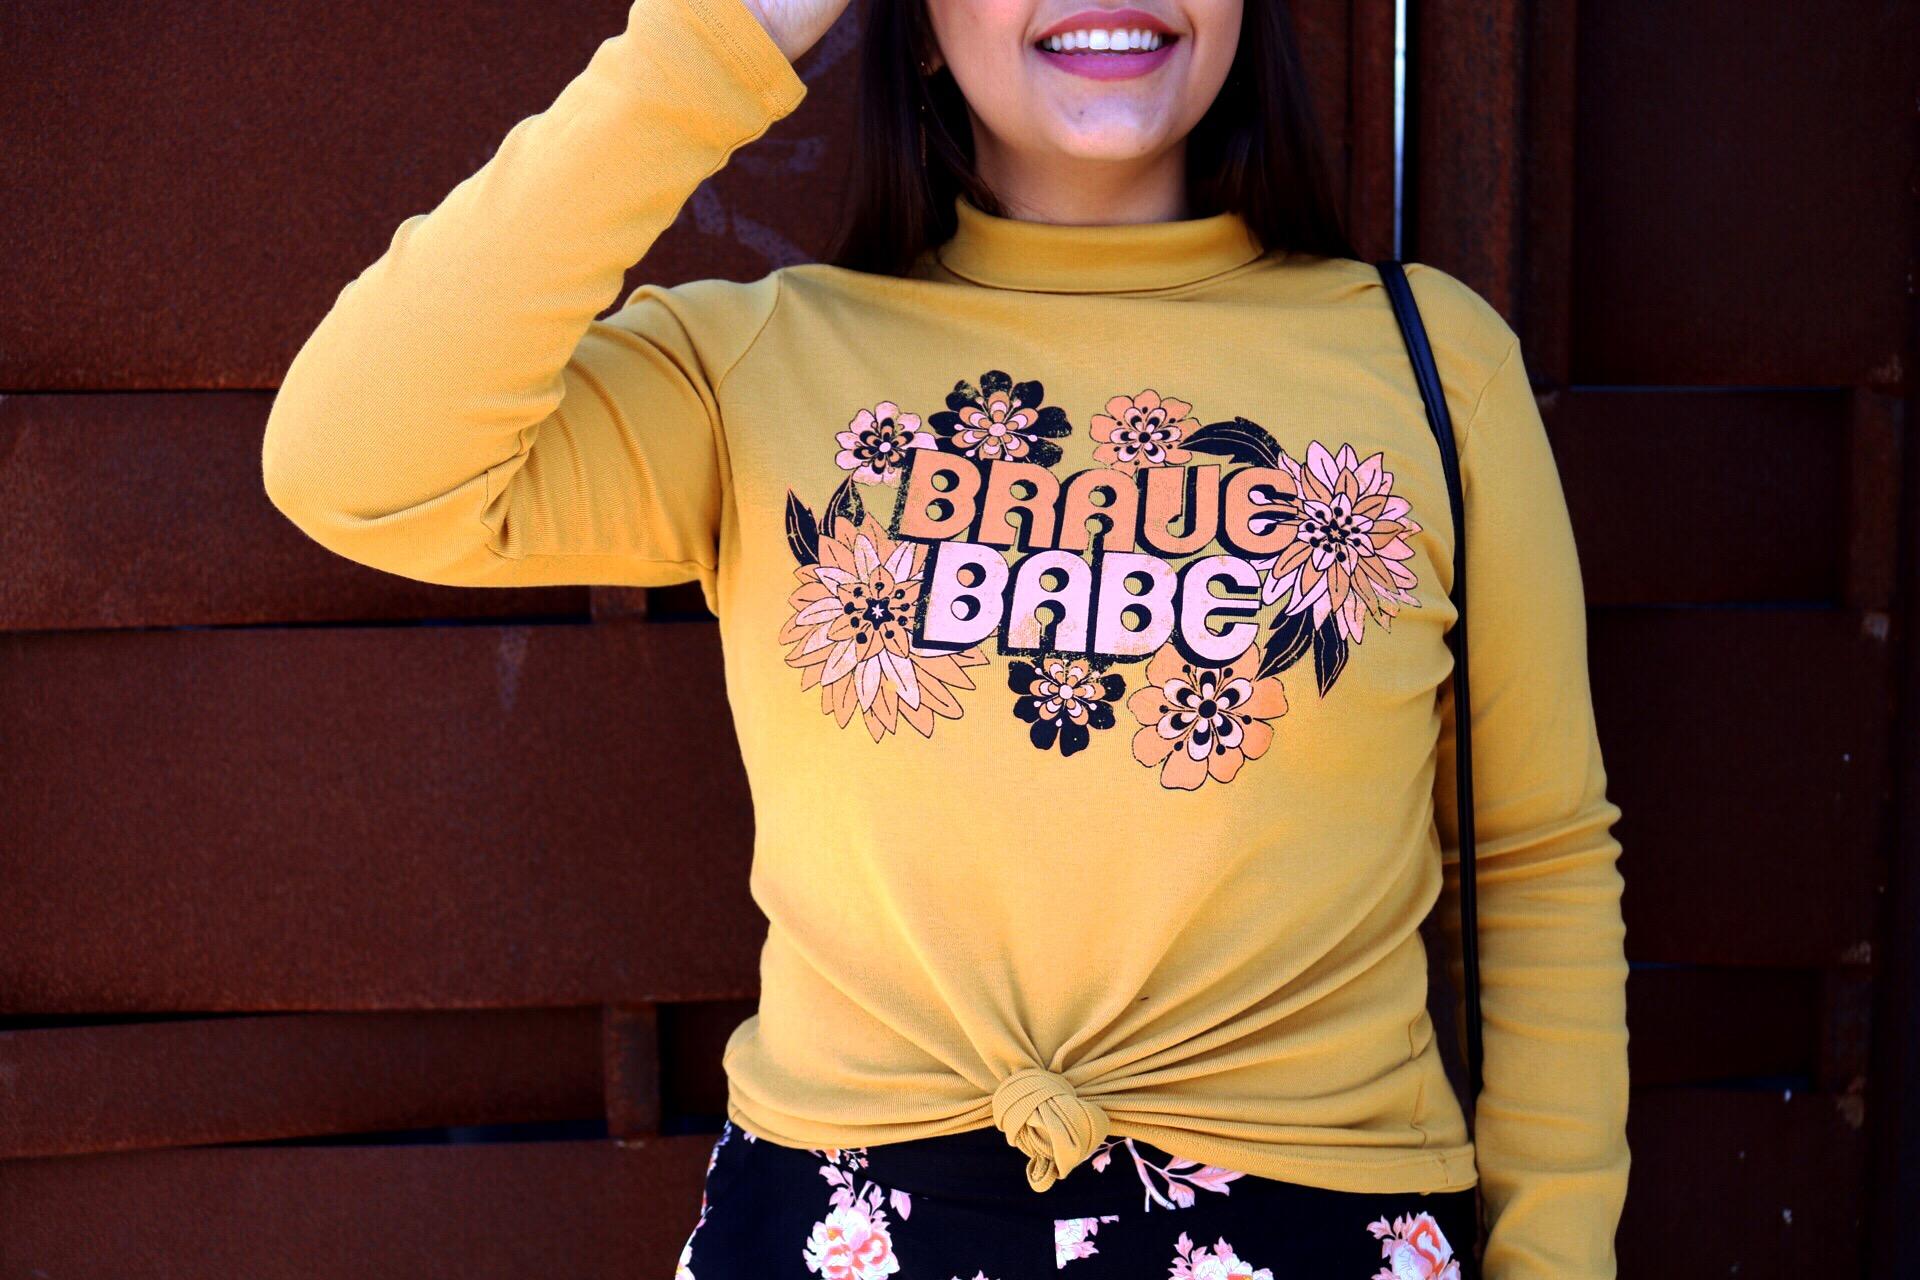 Dazey_LA feminist t-shirt Brace Babe t-shirt camel wide brim fedora Black and gold Ban.do BFF bag